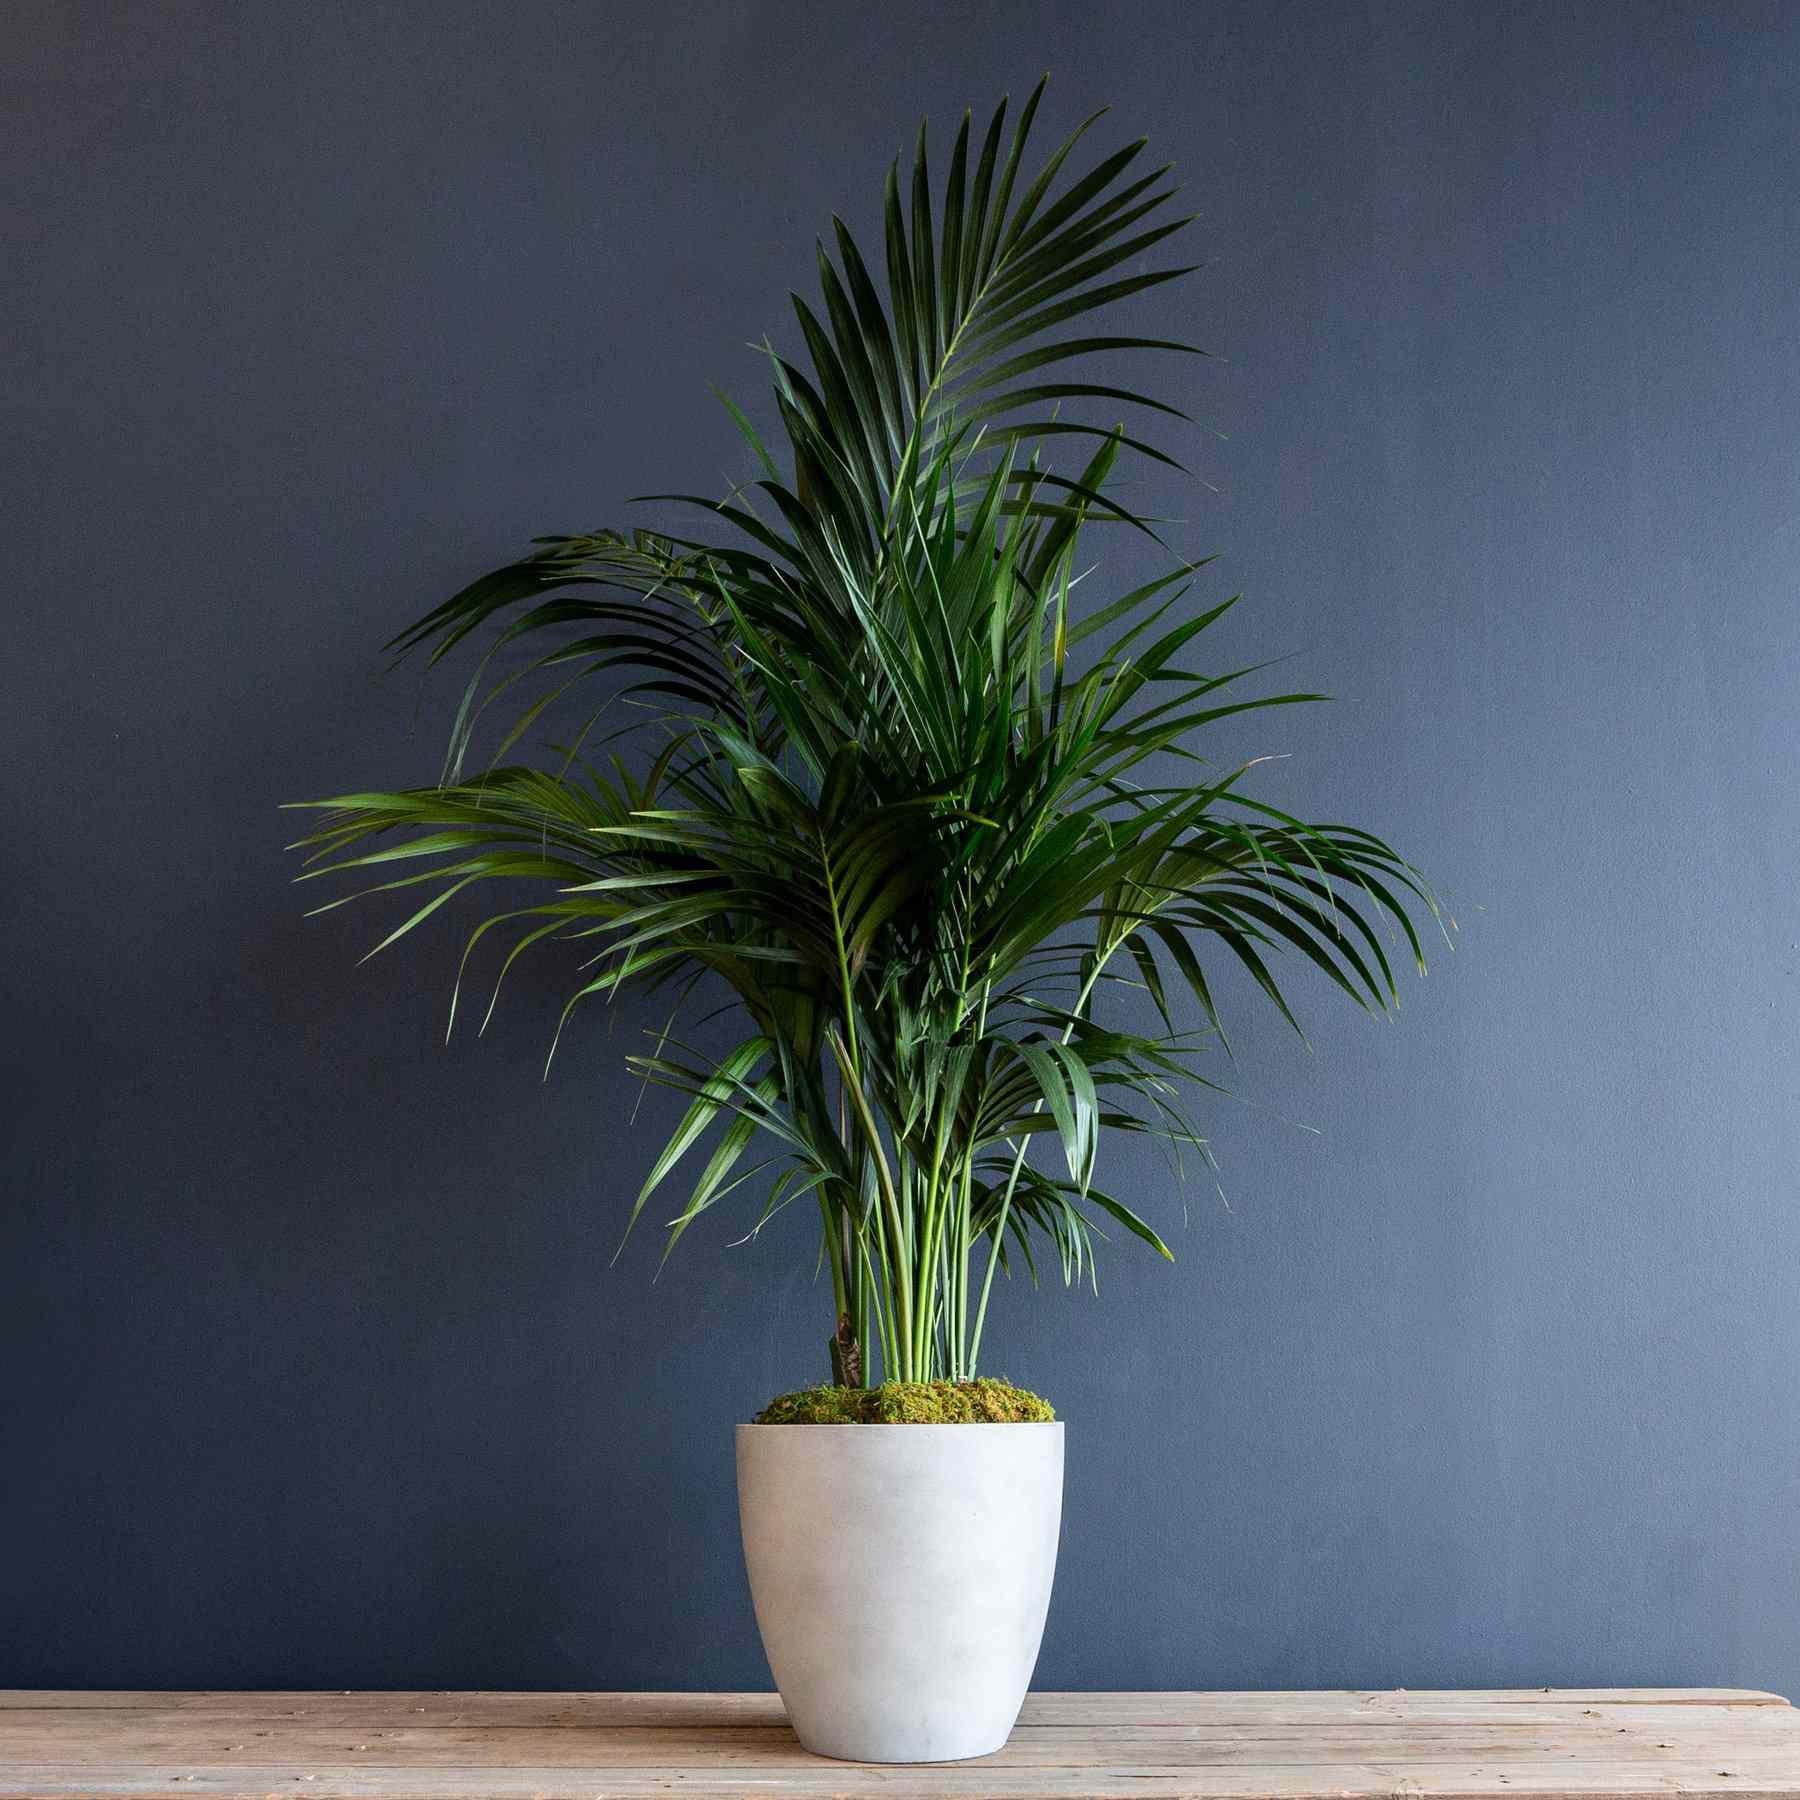 Kentia Palm in a white planter against a blue wall